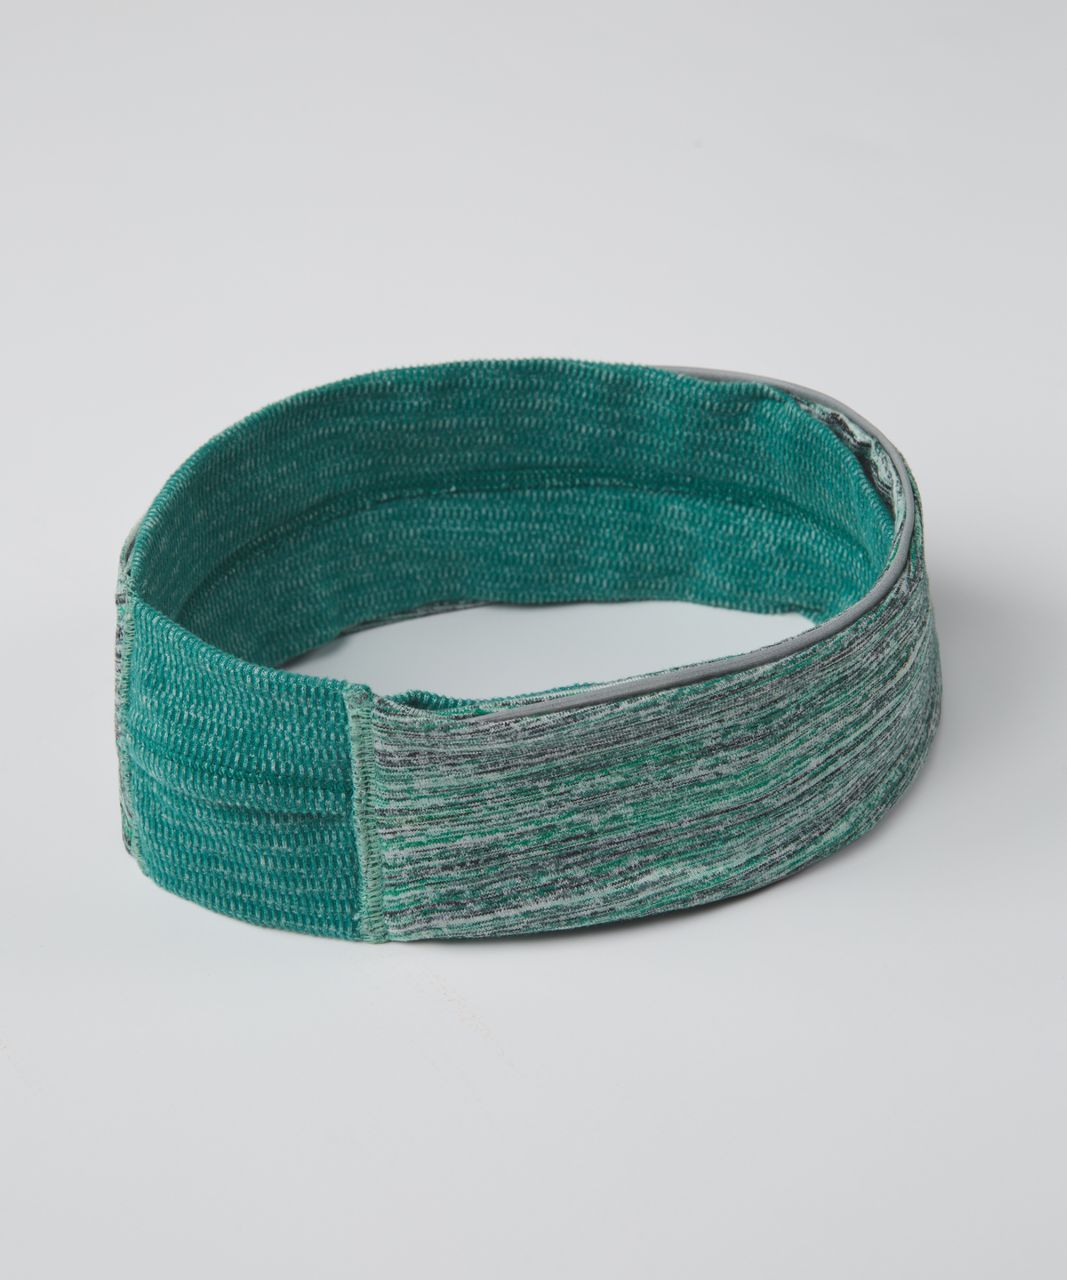 Lululemon Run And Done Ear Warmer - Mini Check Pique Hunter Green Heathered Hunter Green / Space Dye Camo Forage Teal Black